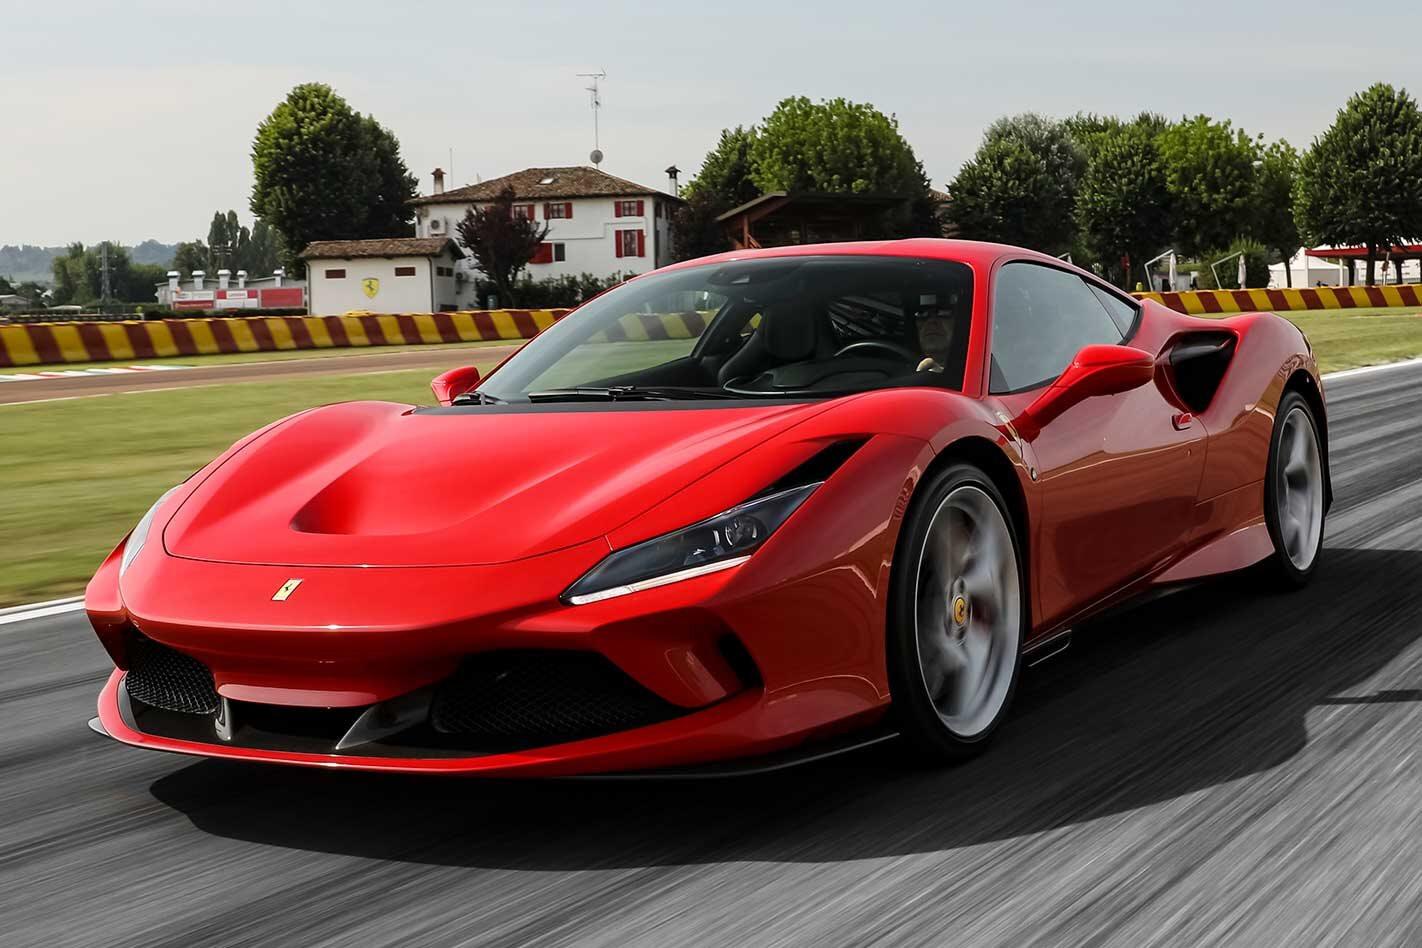 Ferrari F8 Tributo review